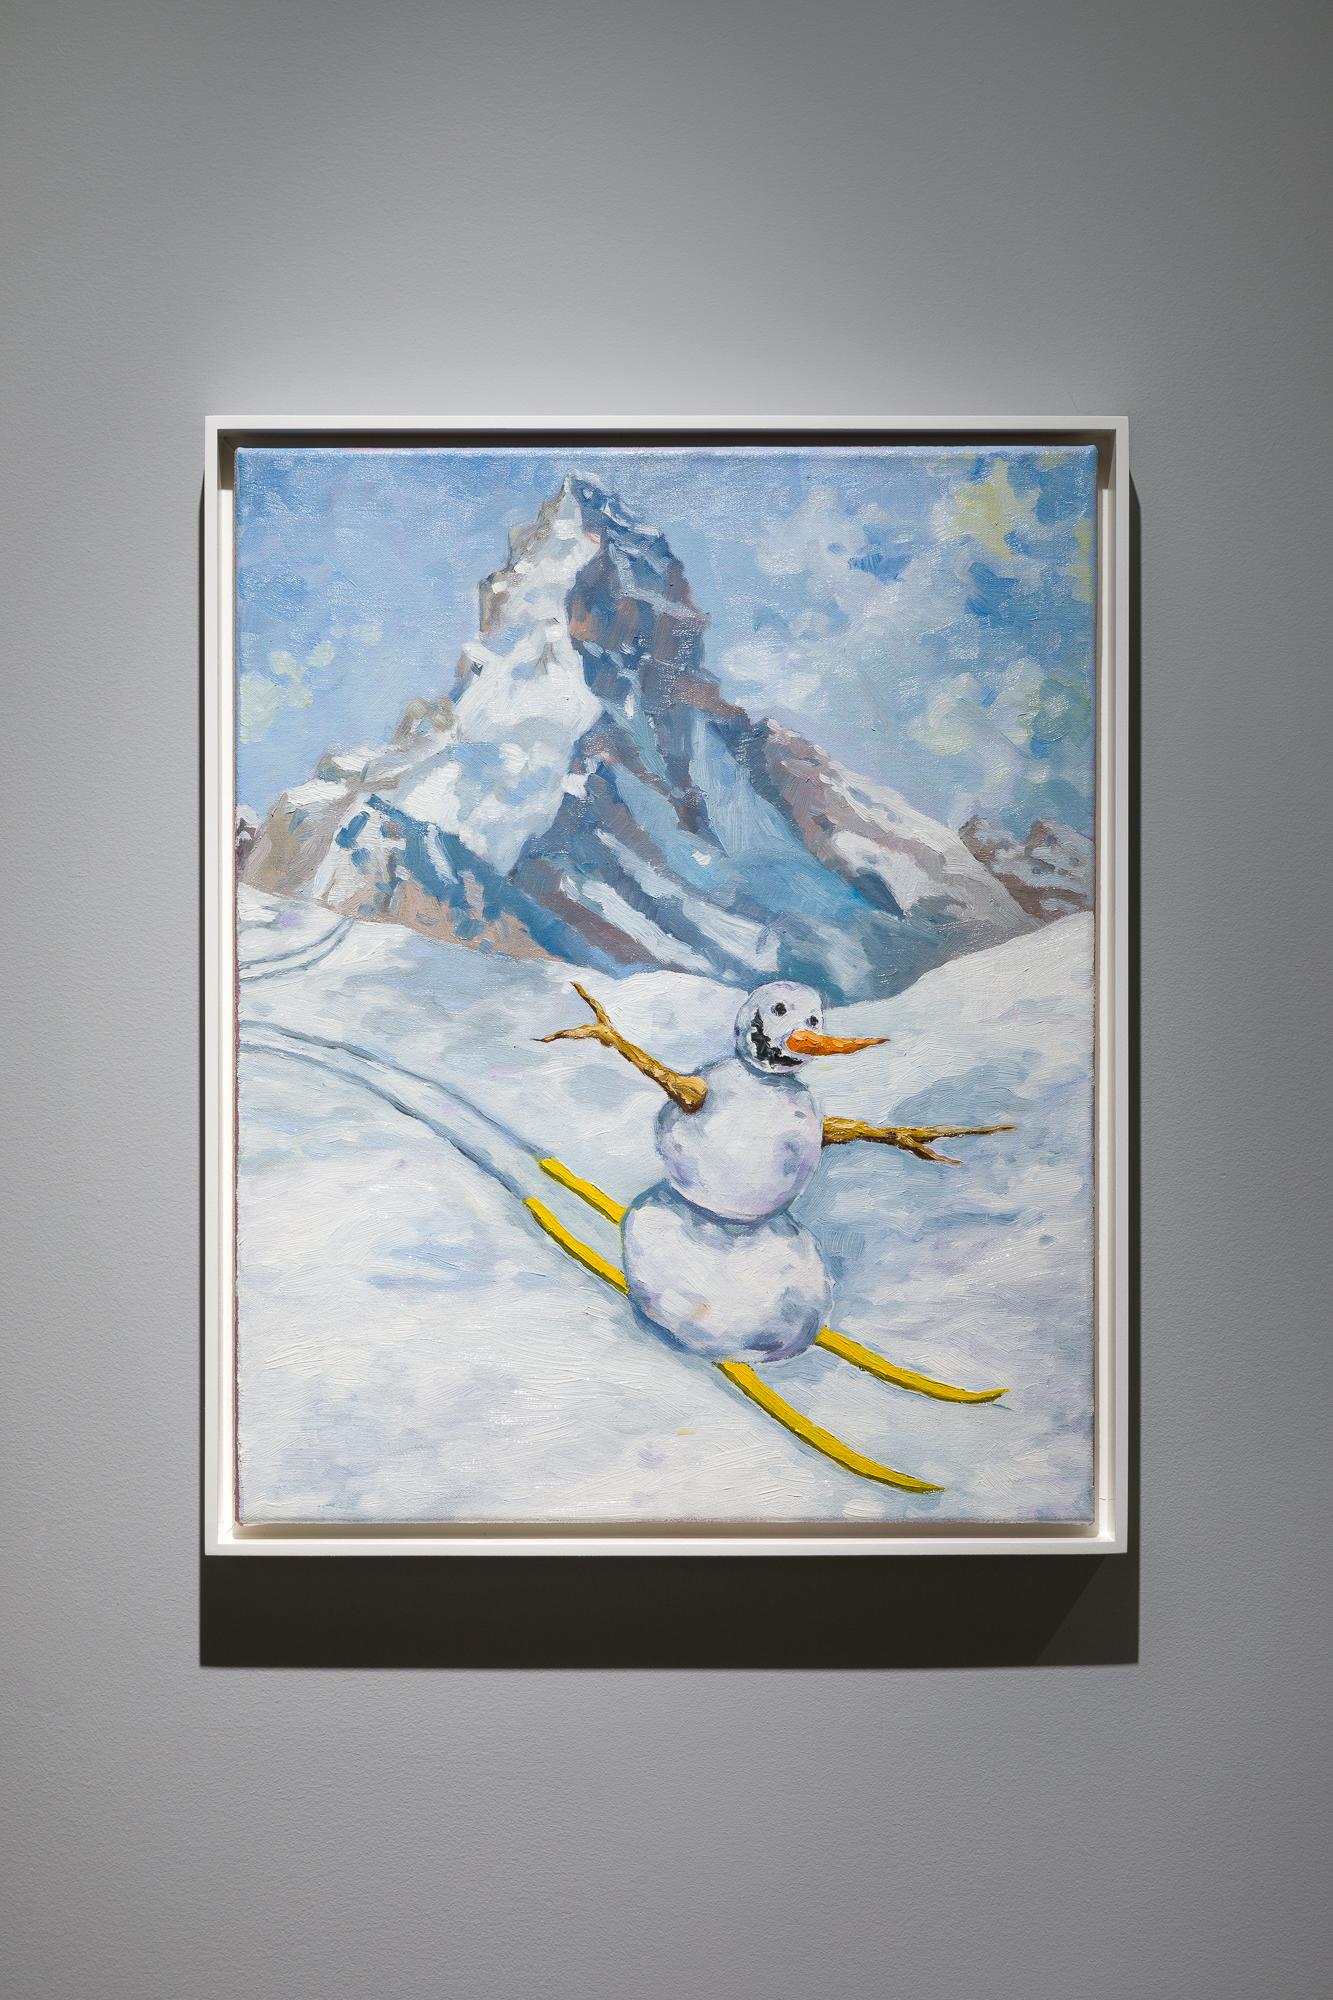 Skiing Snowman: Jan Kiefer Swiss Institute